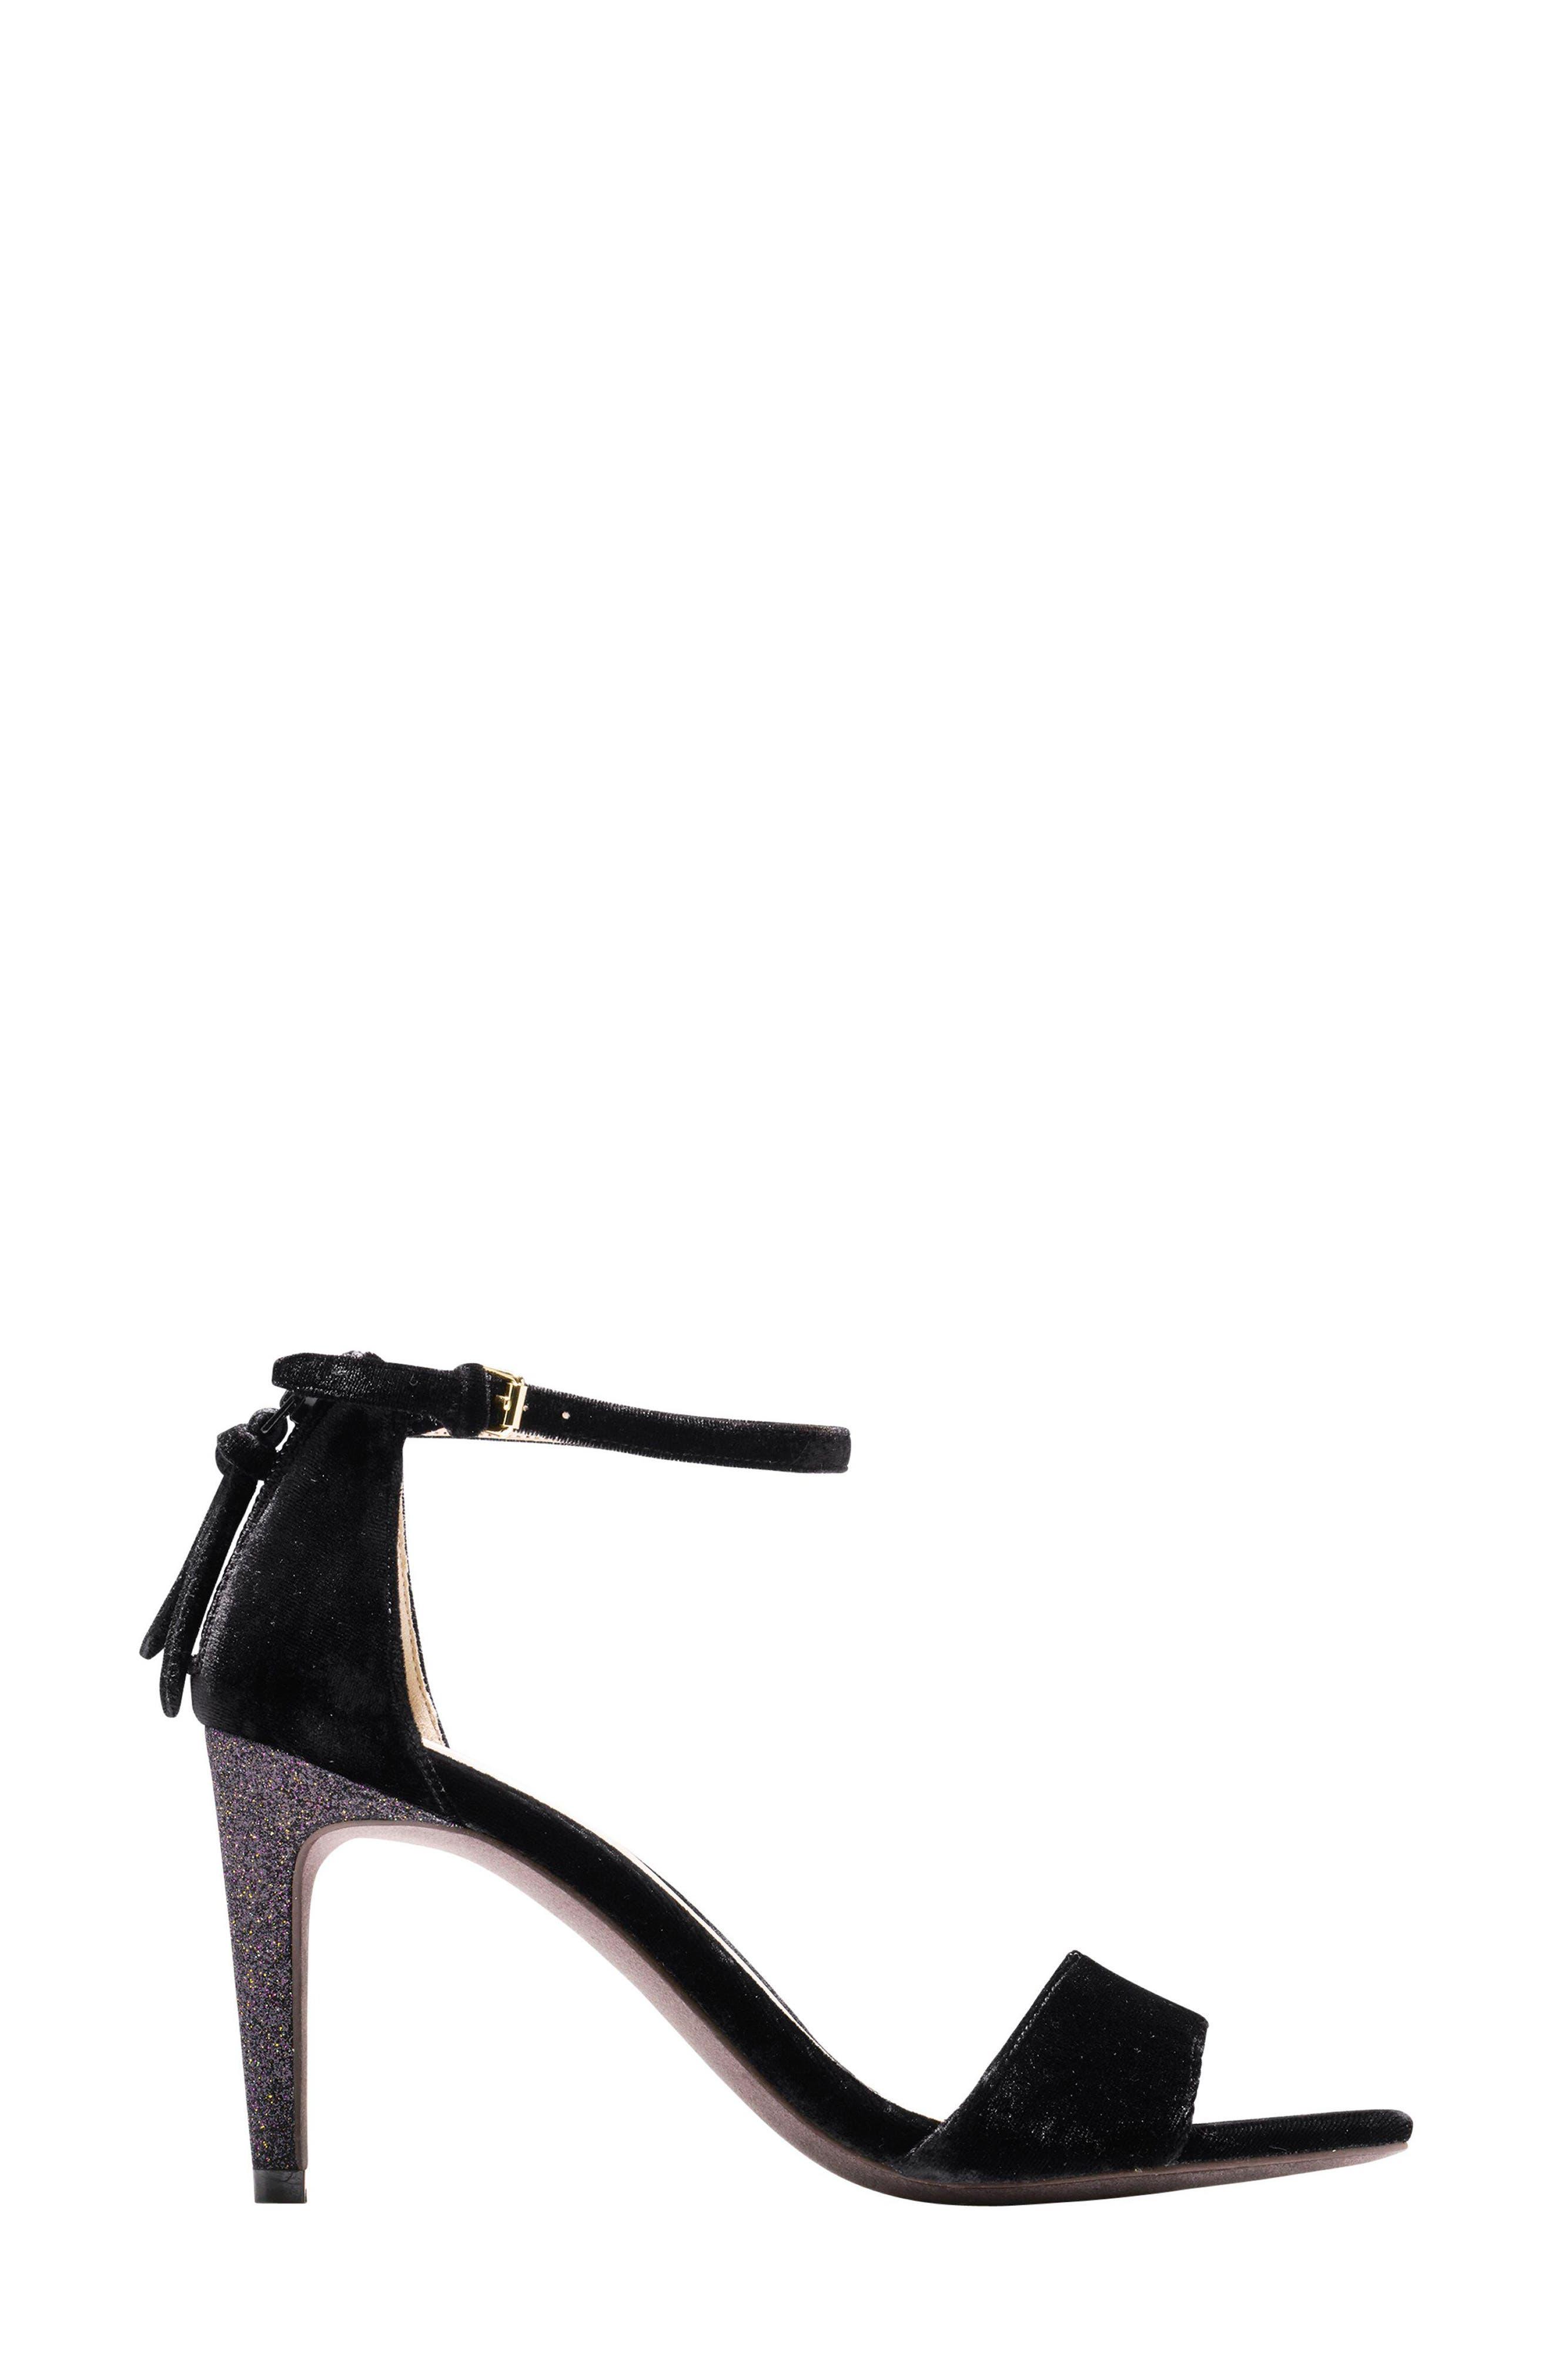 Clara Grand Ankle Strap Sandal,                             Alternate thumbnail 3, color,                             001